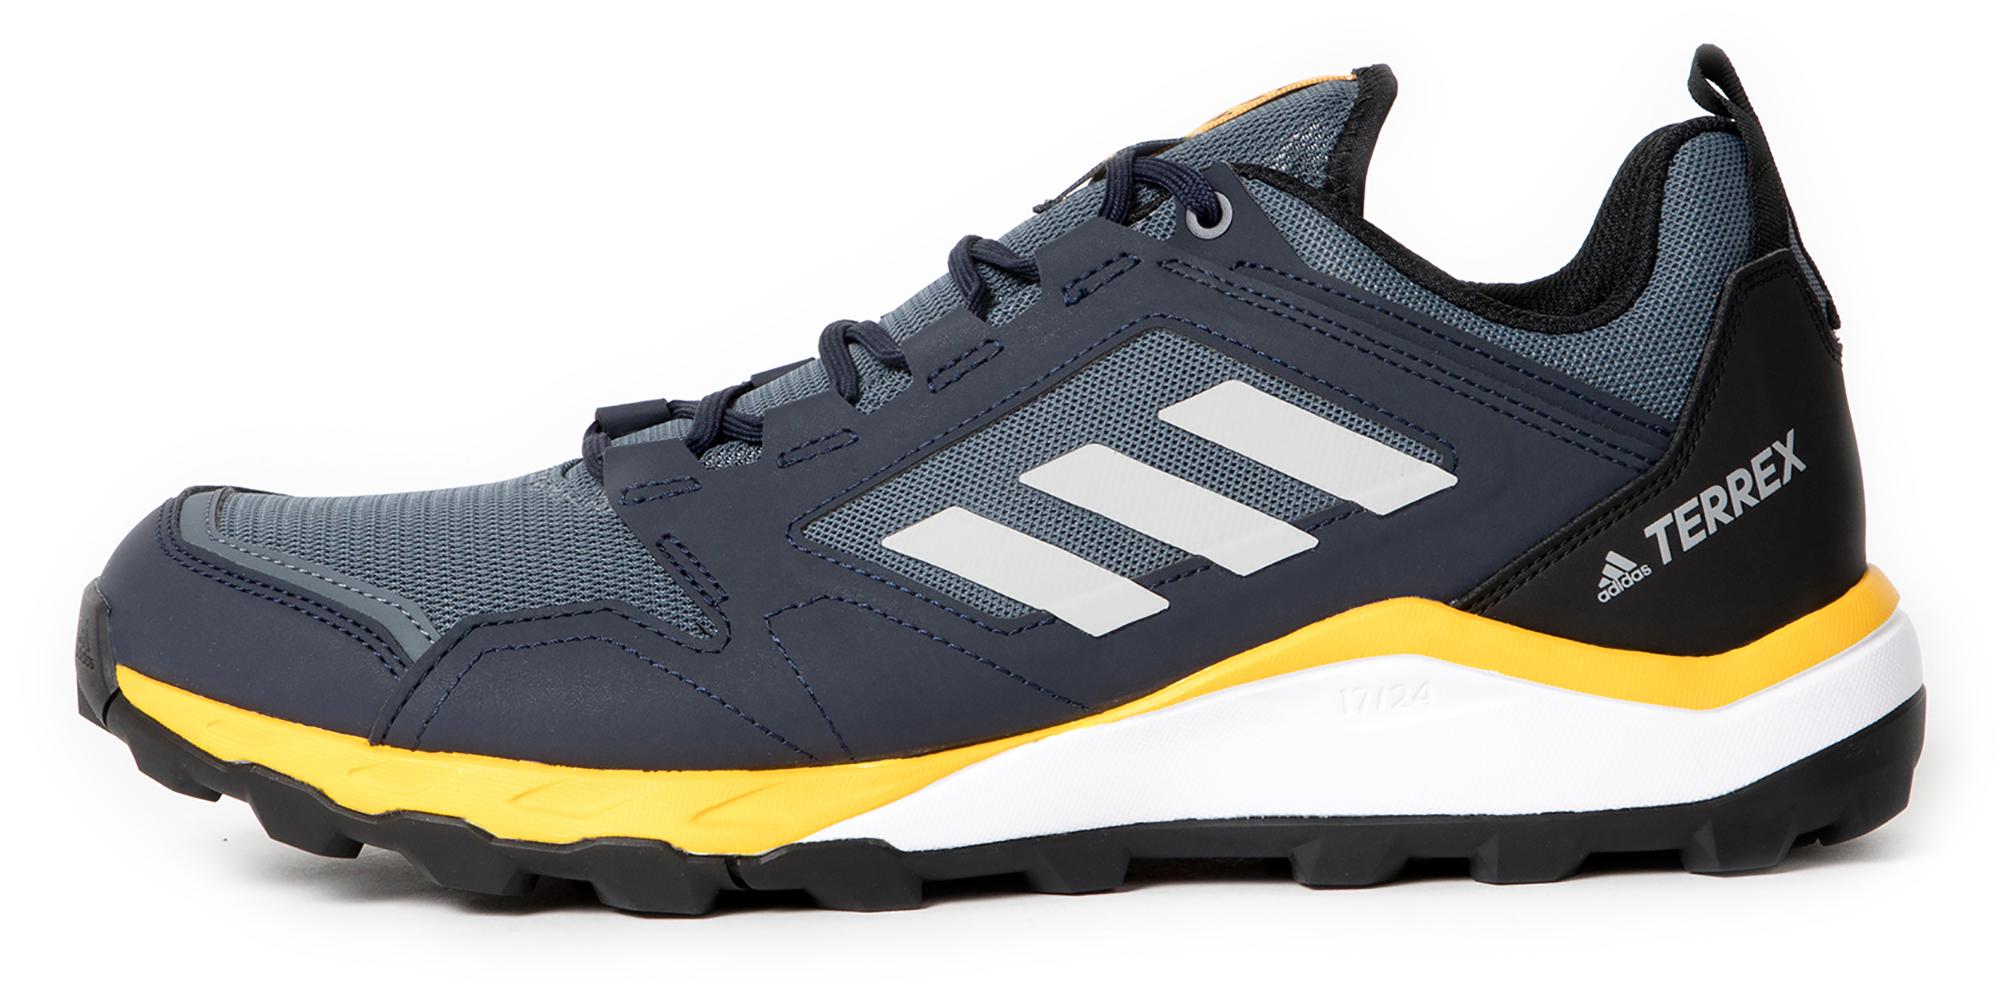 Adidas Кроссовки мужские Adidas Terrex Agravic Tr, размер 42.5 adidas ботинки мужские adidas terrex tivid mid climaproof размер 40